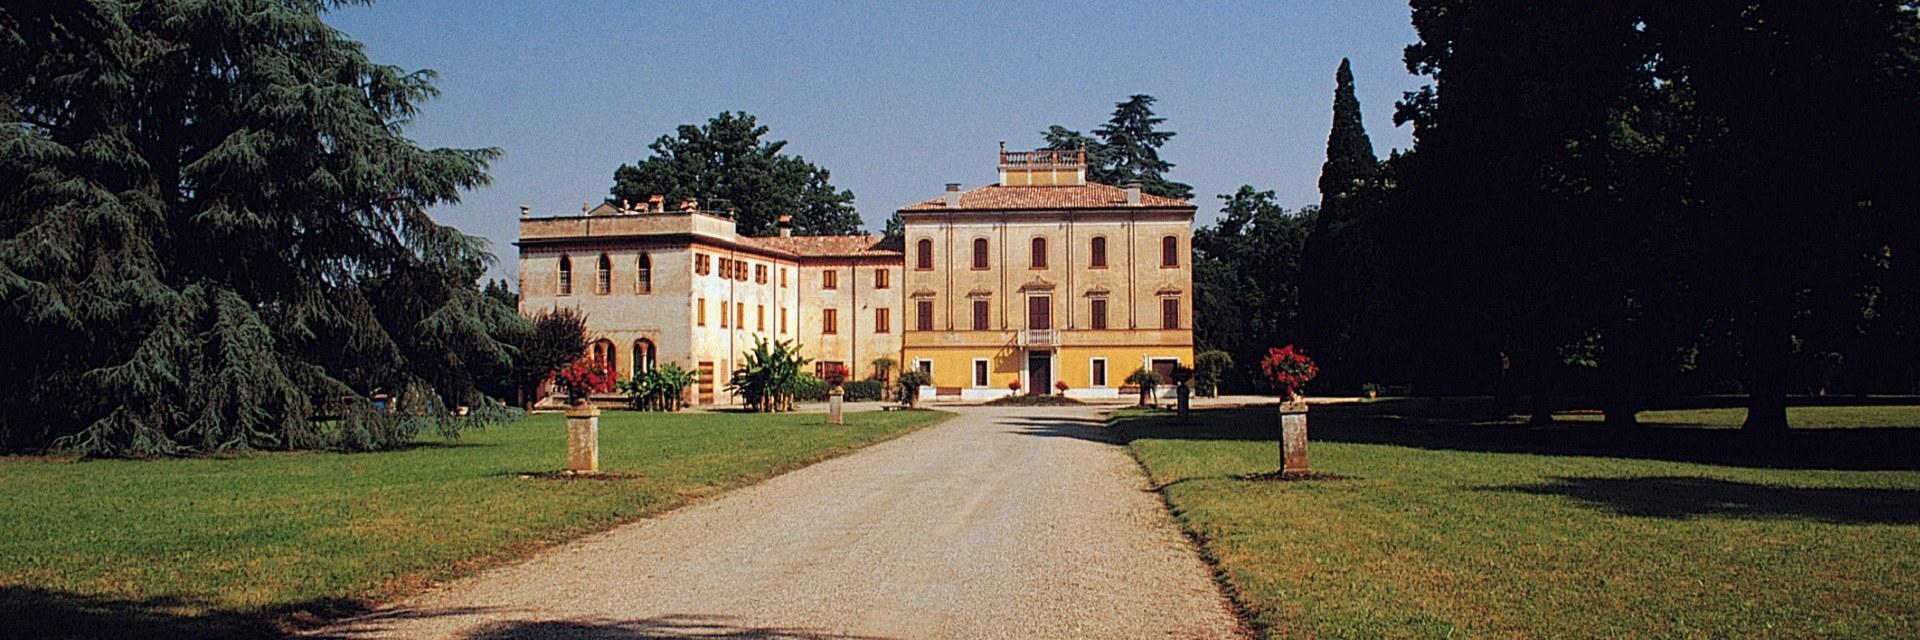 Villa Campori